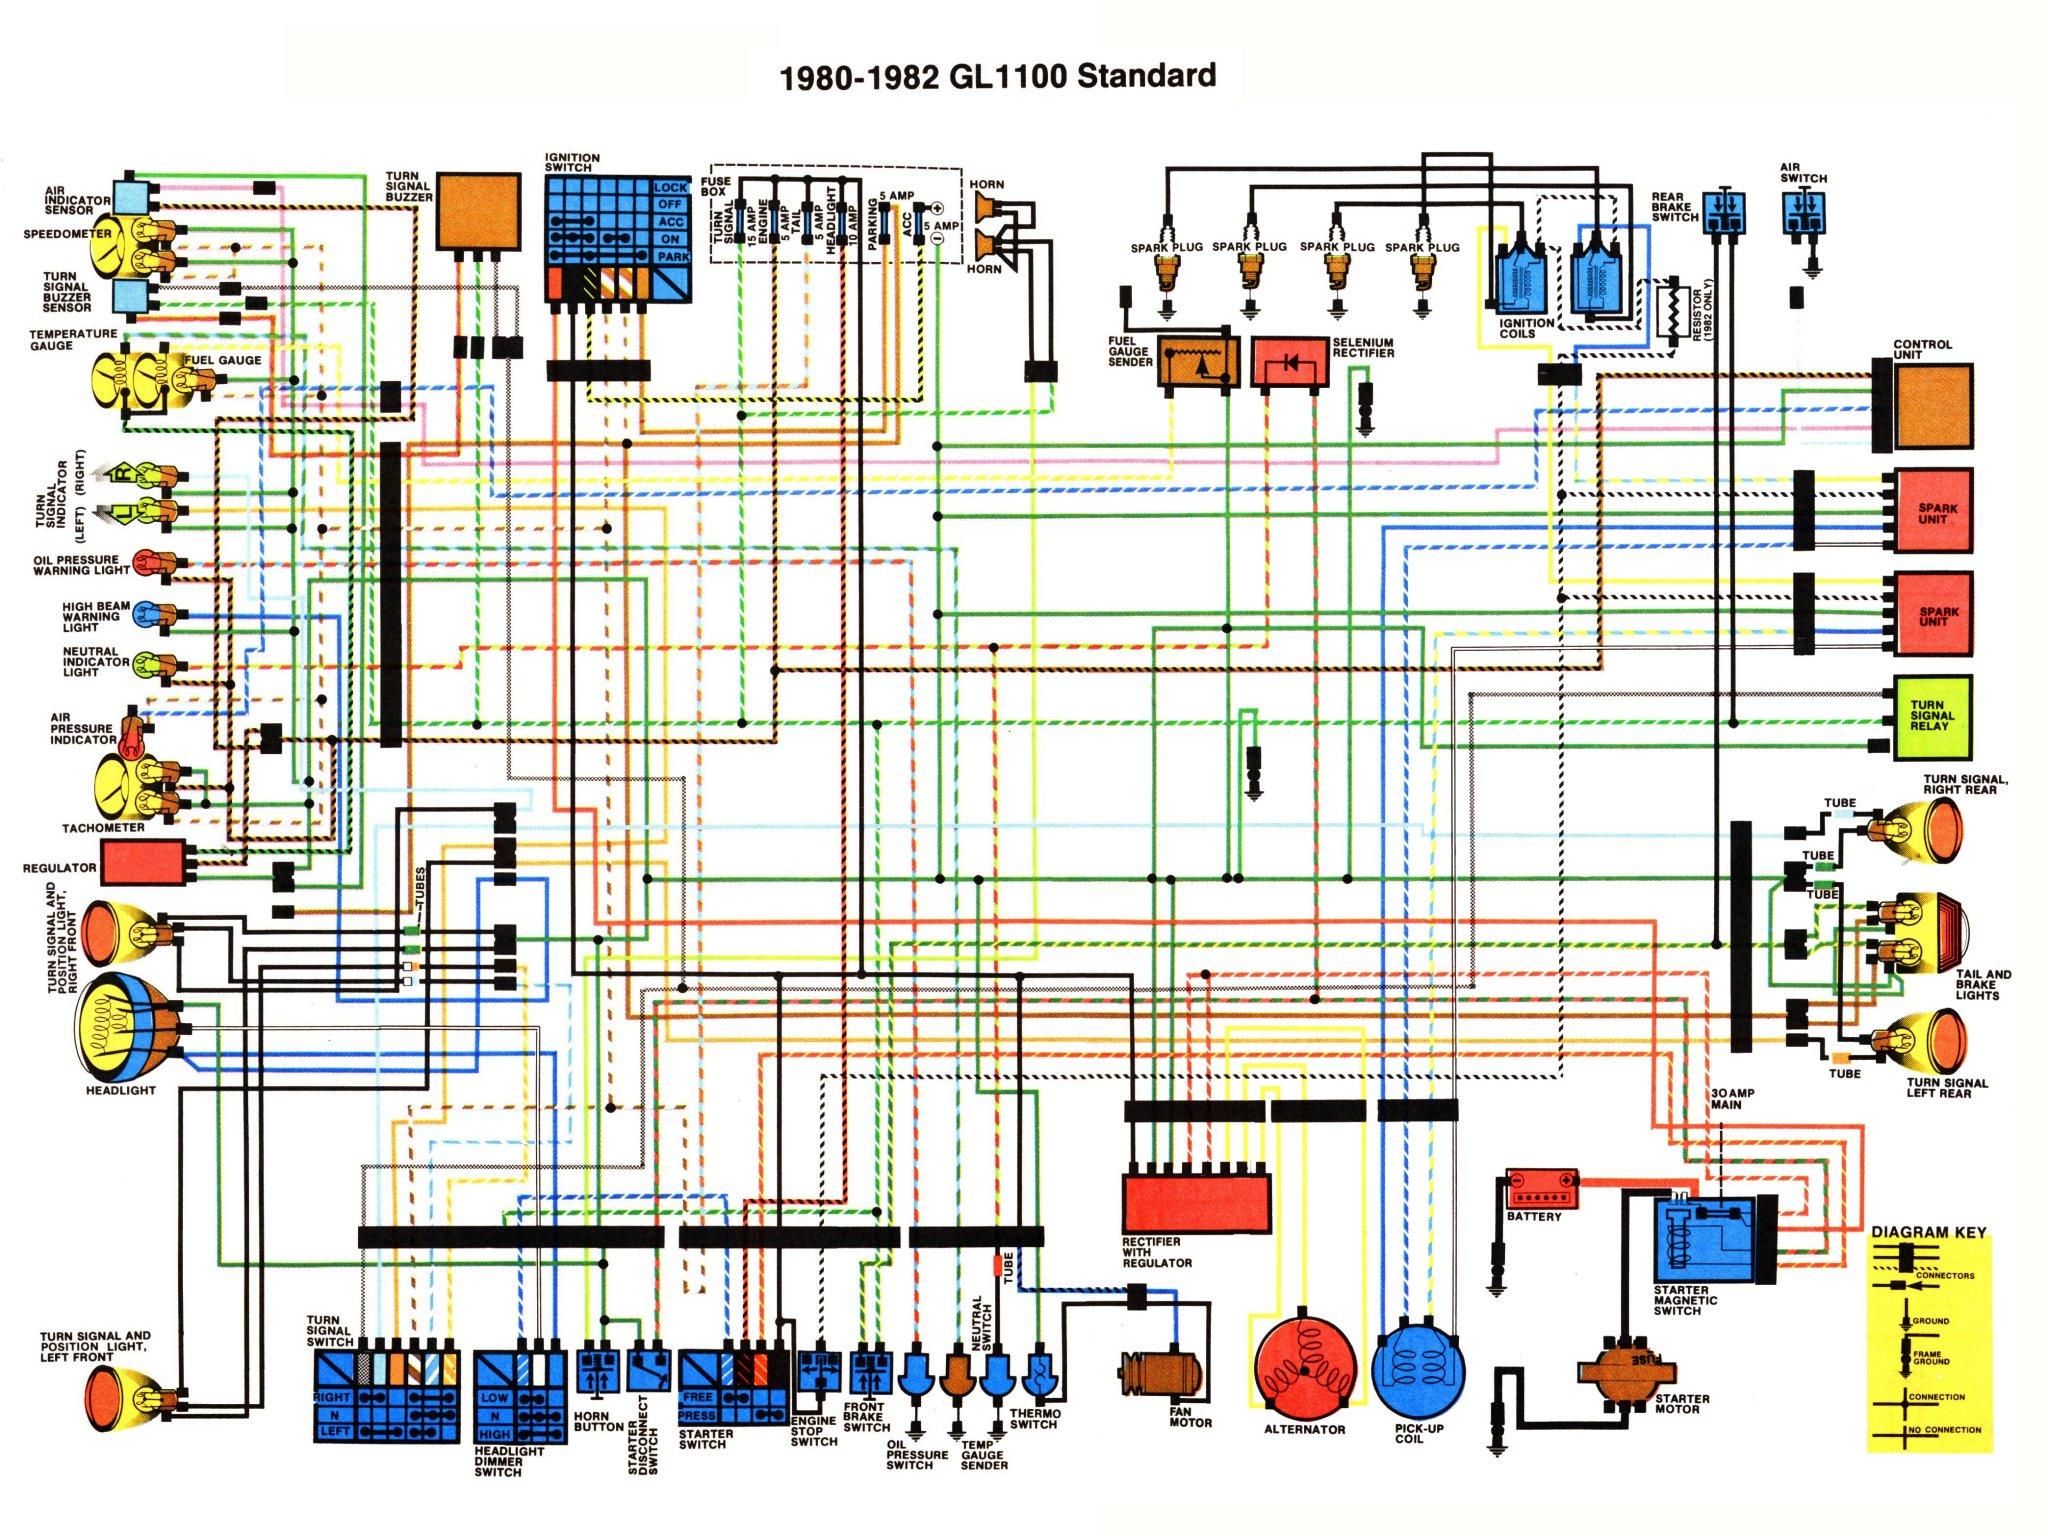 [DIAGRAM_34OR]  FA_2935] Honda Ft500 Wiring Diagram Download Diagram | Honda Ascot Ft500 Wiring Diagram |  | Orsal Ungo Birdem Phot Chor Iness Phon Tran Ntnes Tool Ifica Inst Simij  Chor Mohammedshrine Librar Wiring 101